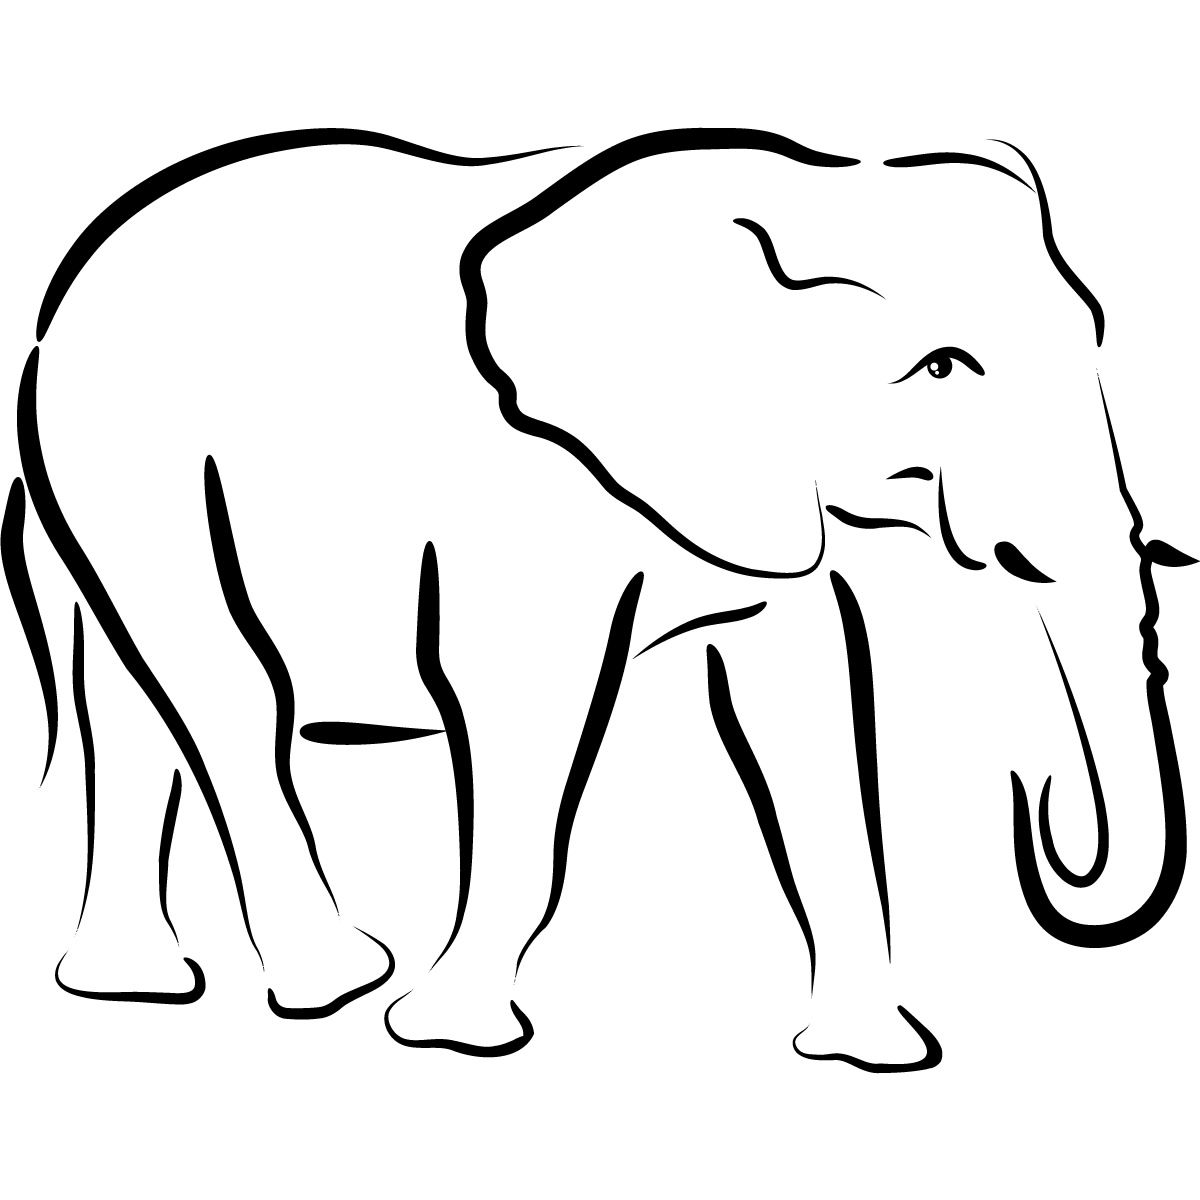 Images For > Elephant Head Profile Outline | Elephants ...